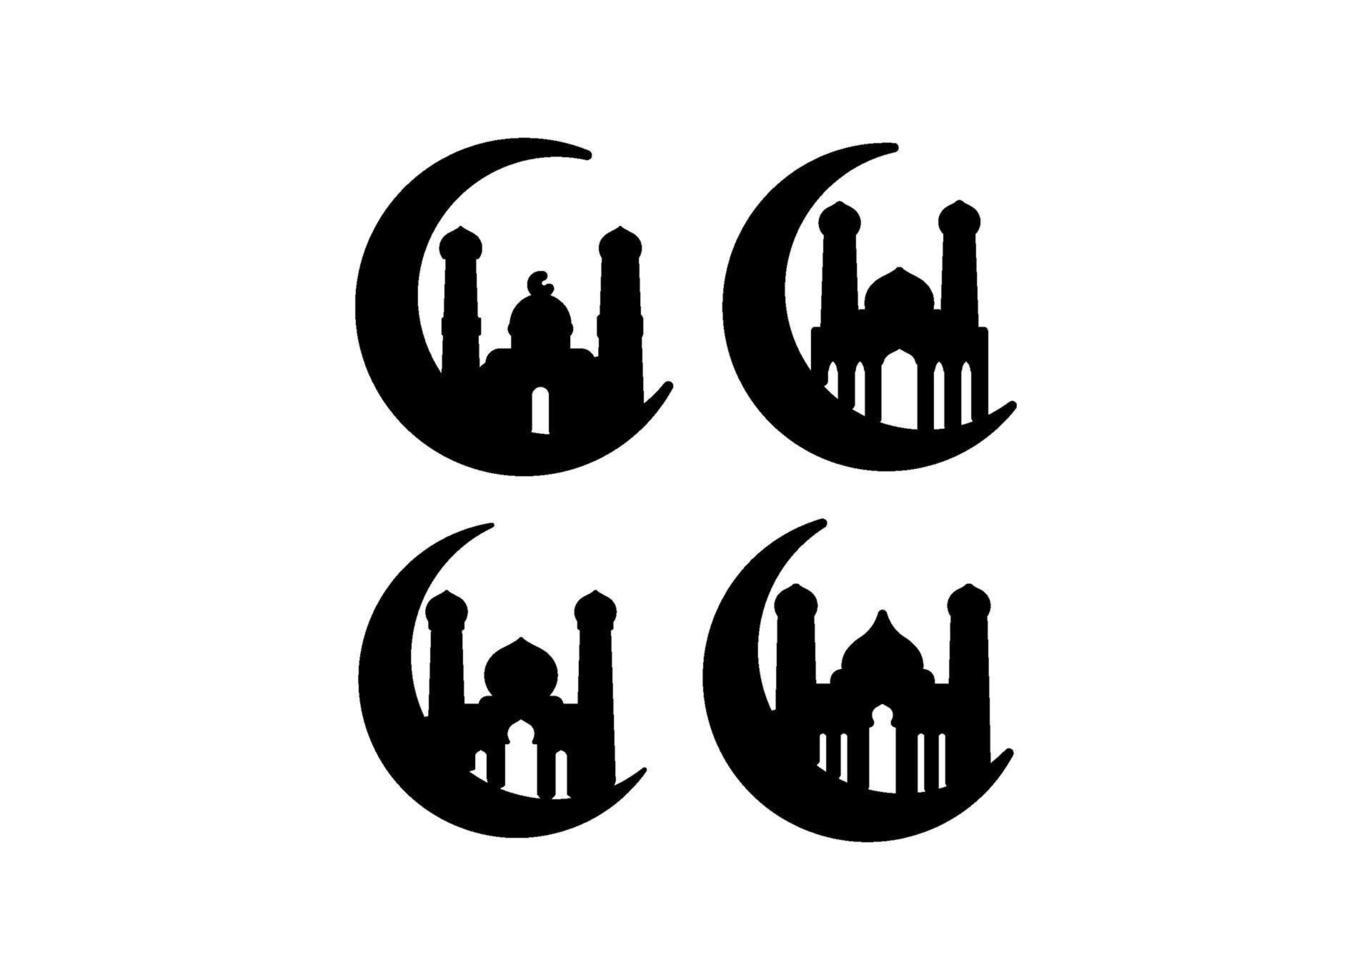 moskee pictogram illustratie vector set